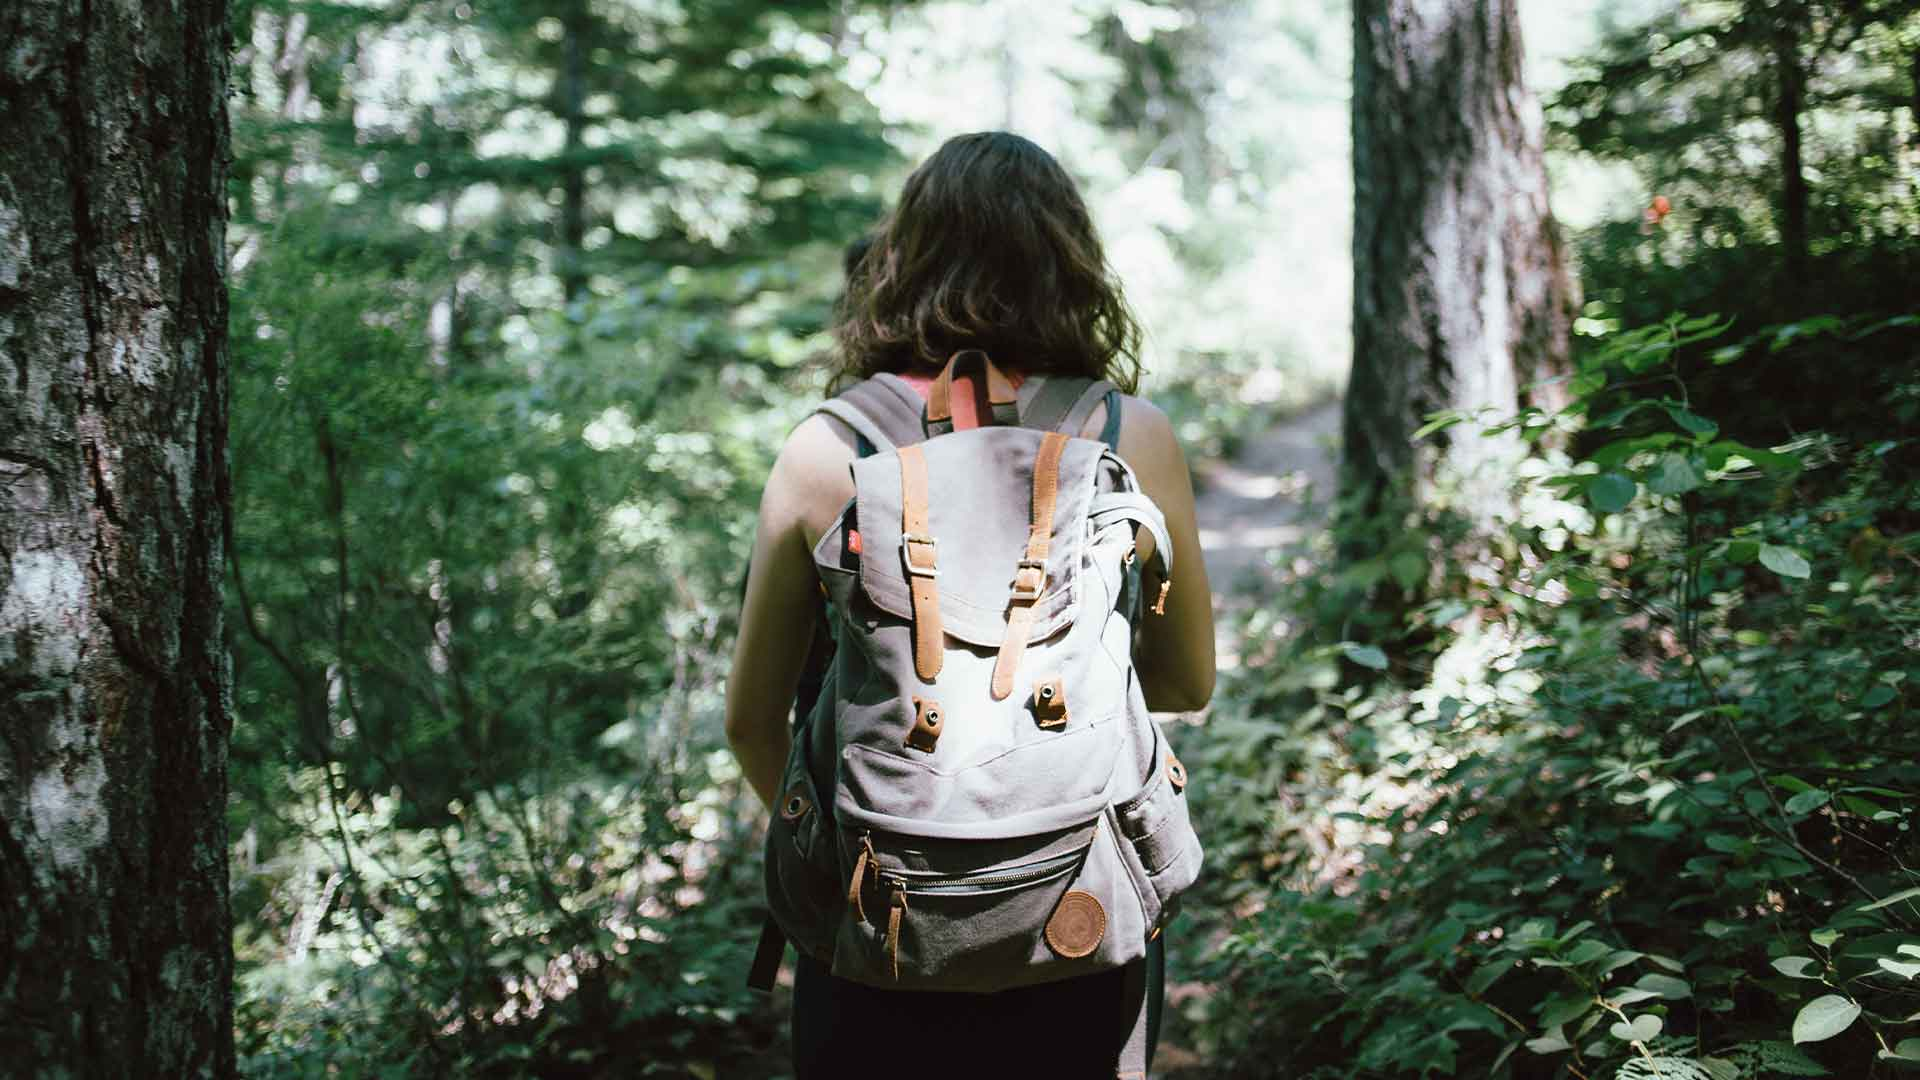 exploring nature on hike